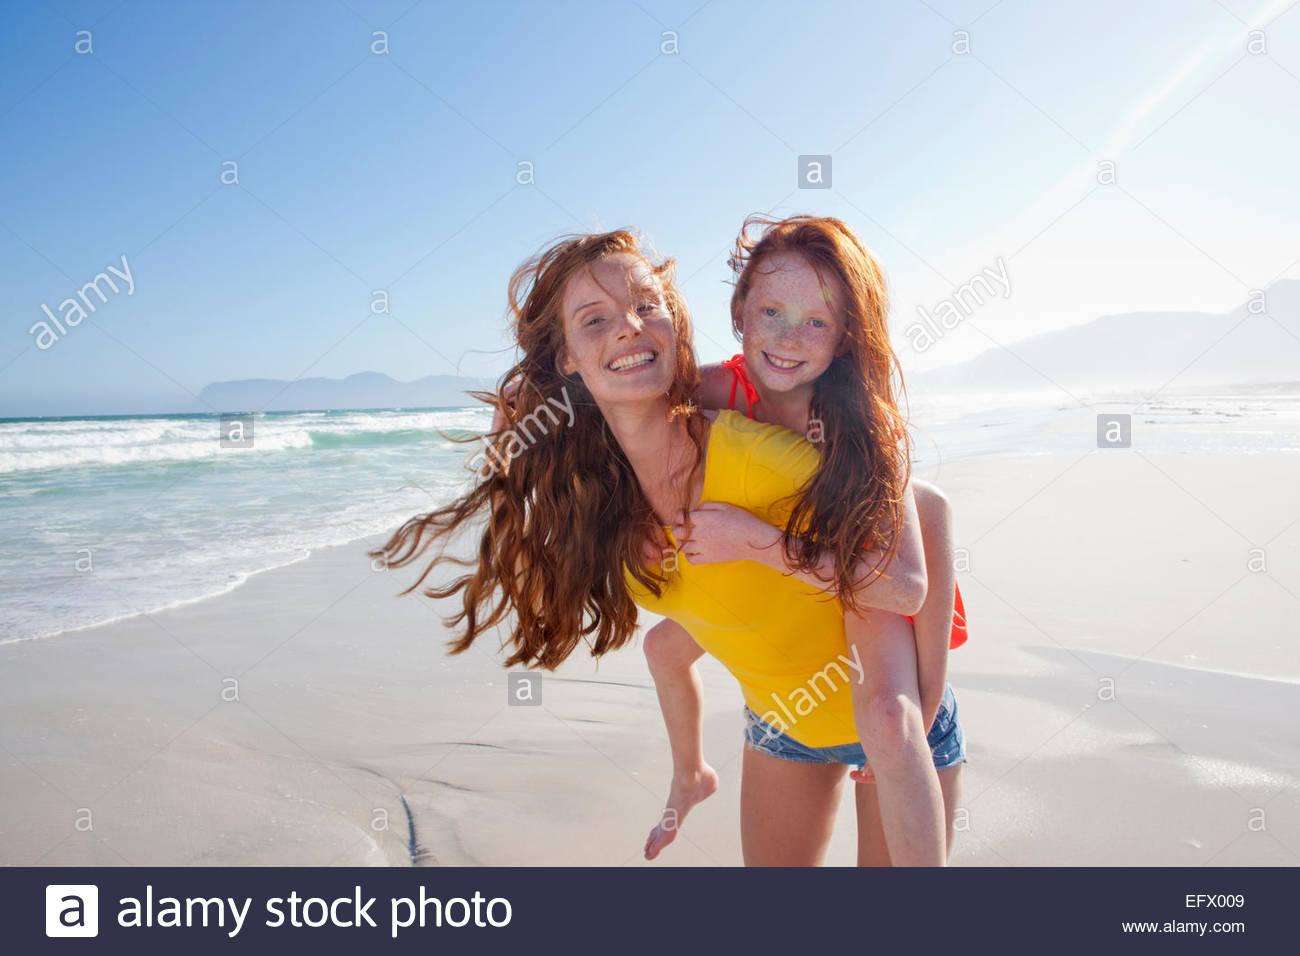 Hija de madre sonriente dando piggy-back en sunny beach Imagen De Stock